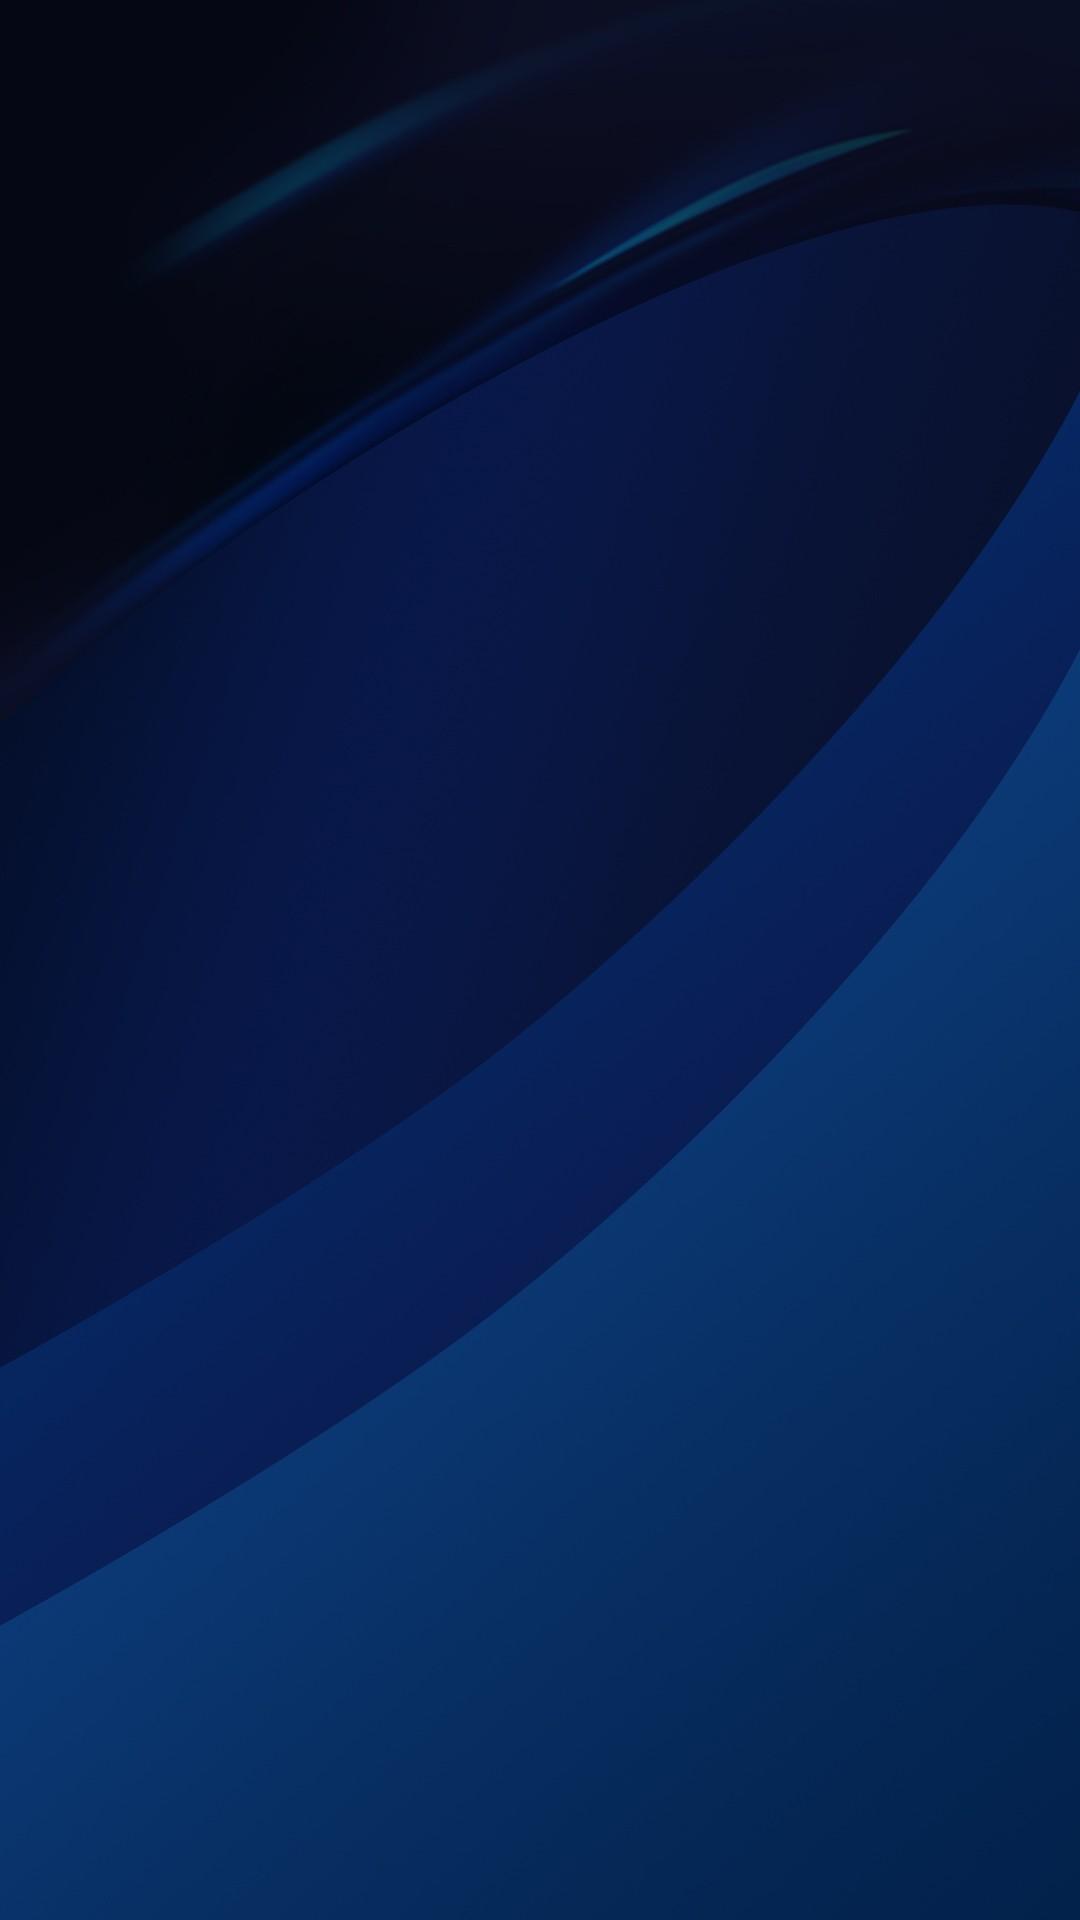 Infinix Note 4 Stock Wallpapers Hd